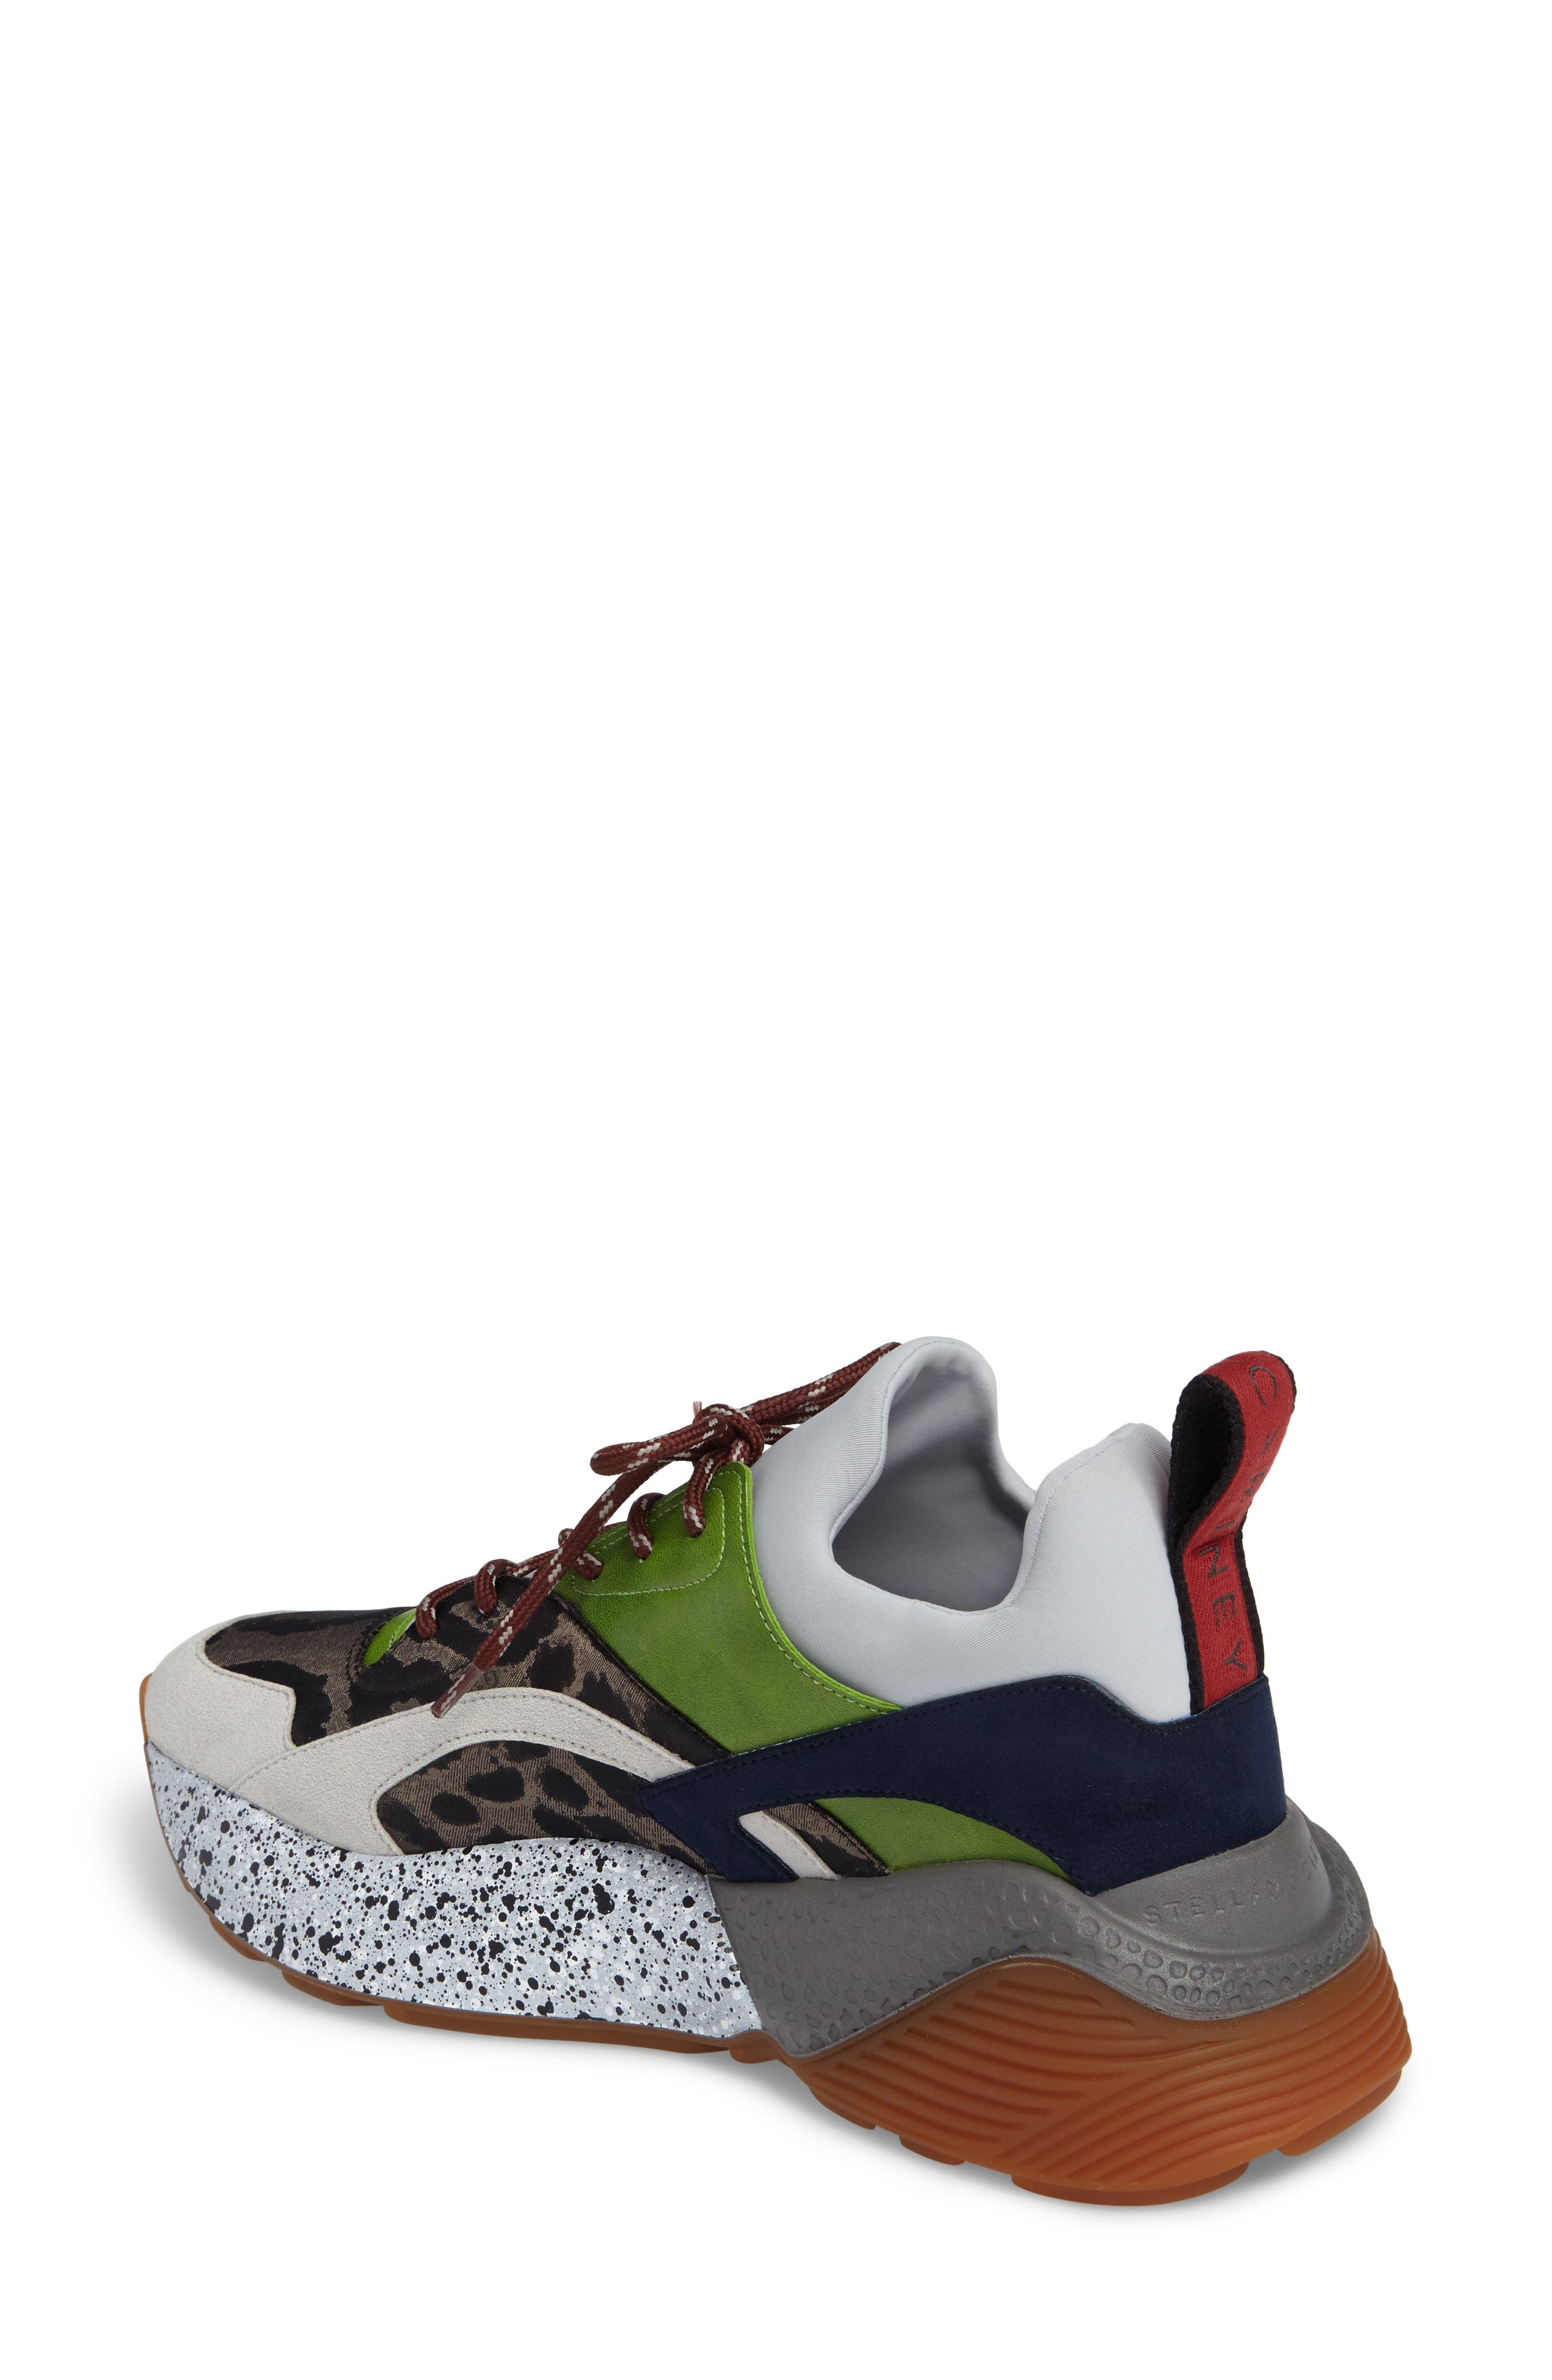 Eclypse Sneaker,                             Alternate thumbnail 2, color,                             020